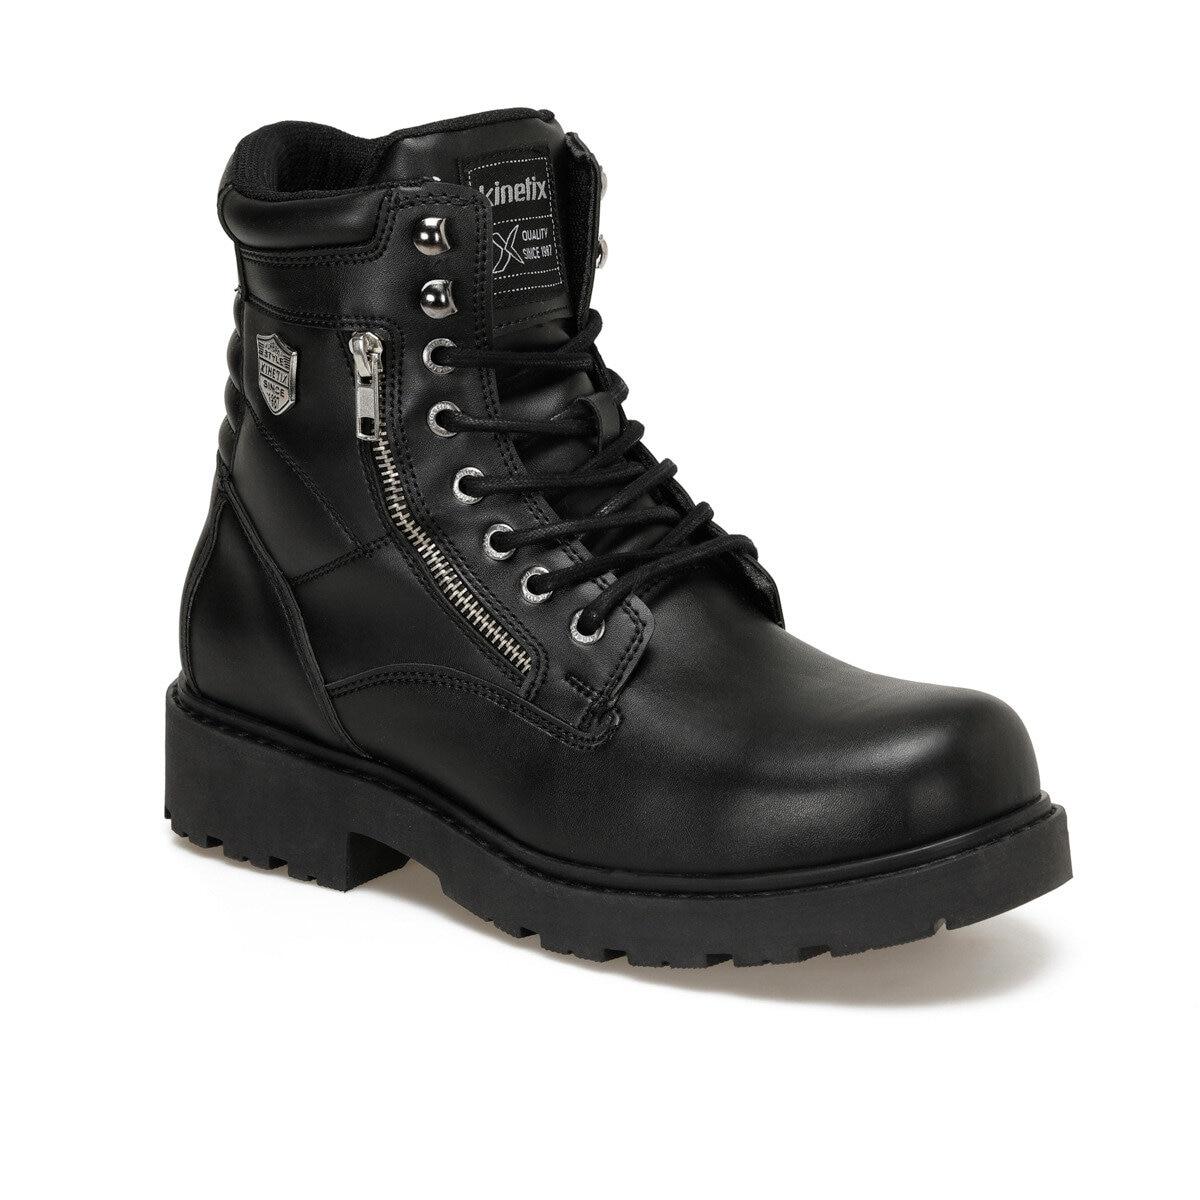 FLO ZOE 9PR Black Men Boots KINETIX